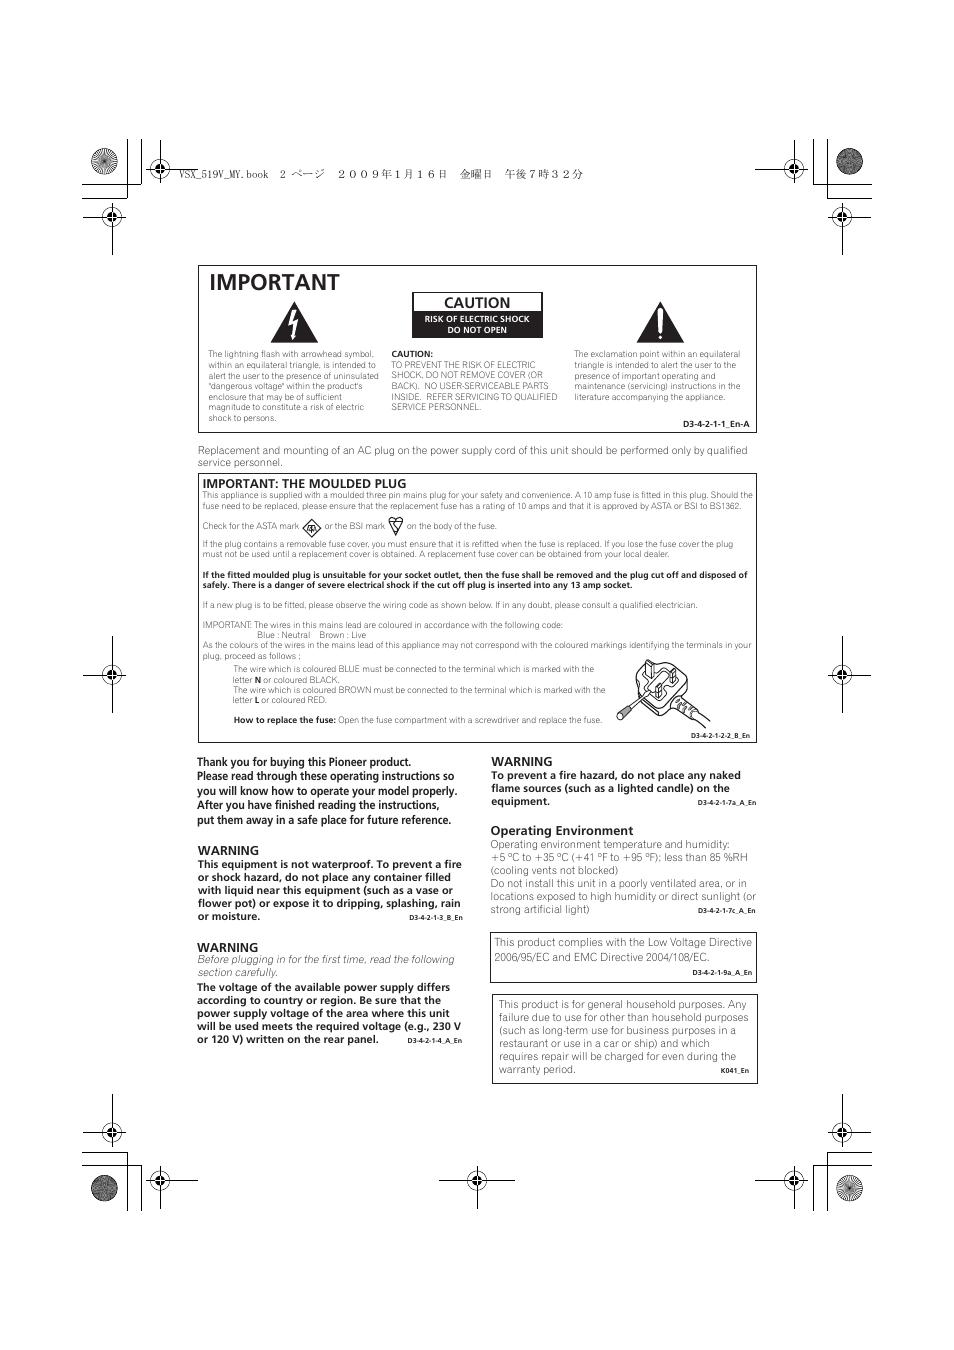 Download free pdf for pioneer vsx-519v receiver manual.